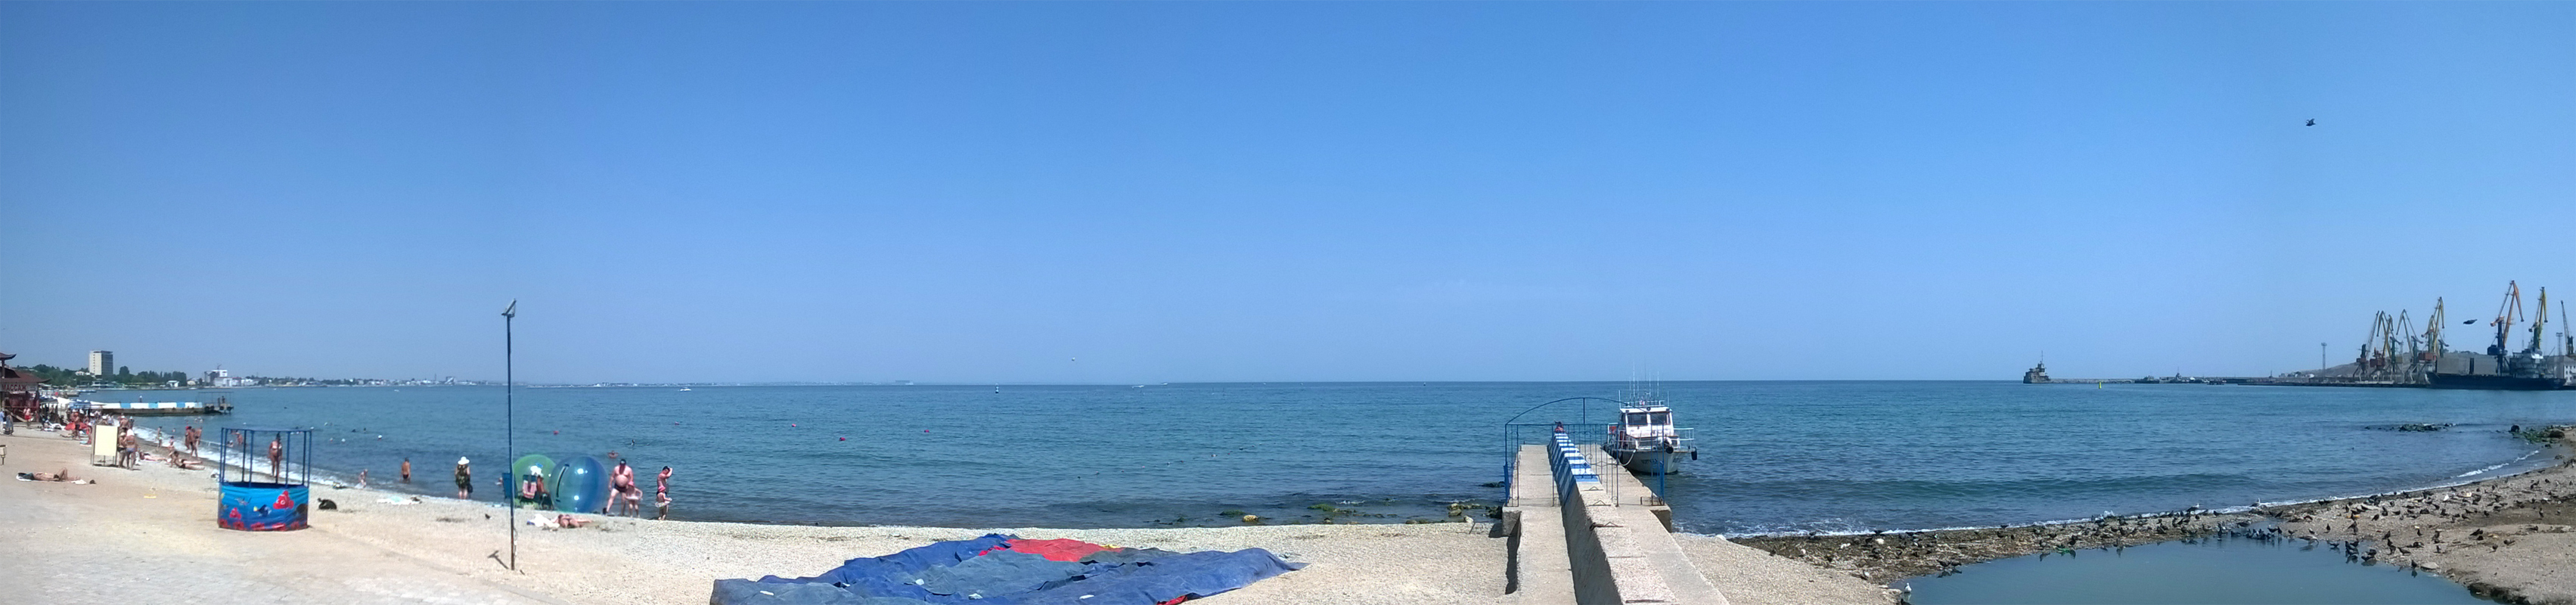 170825_Panorama1